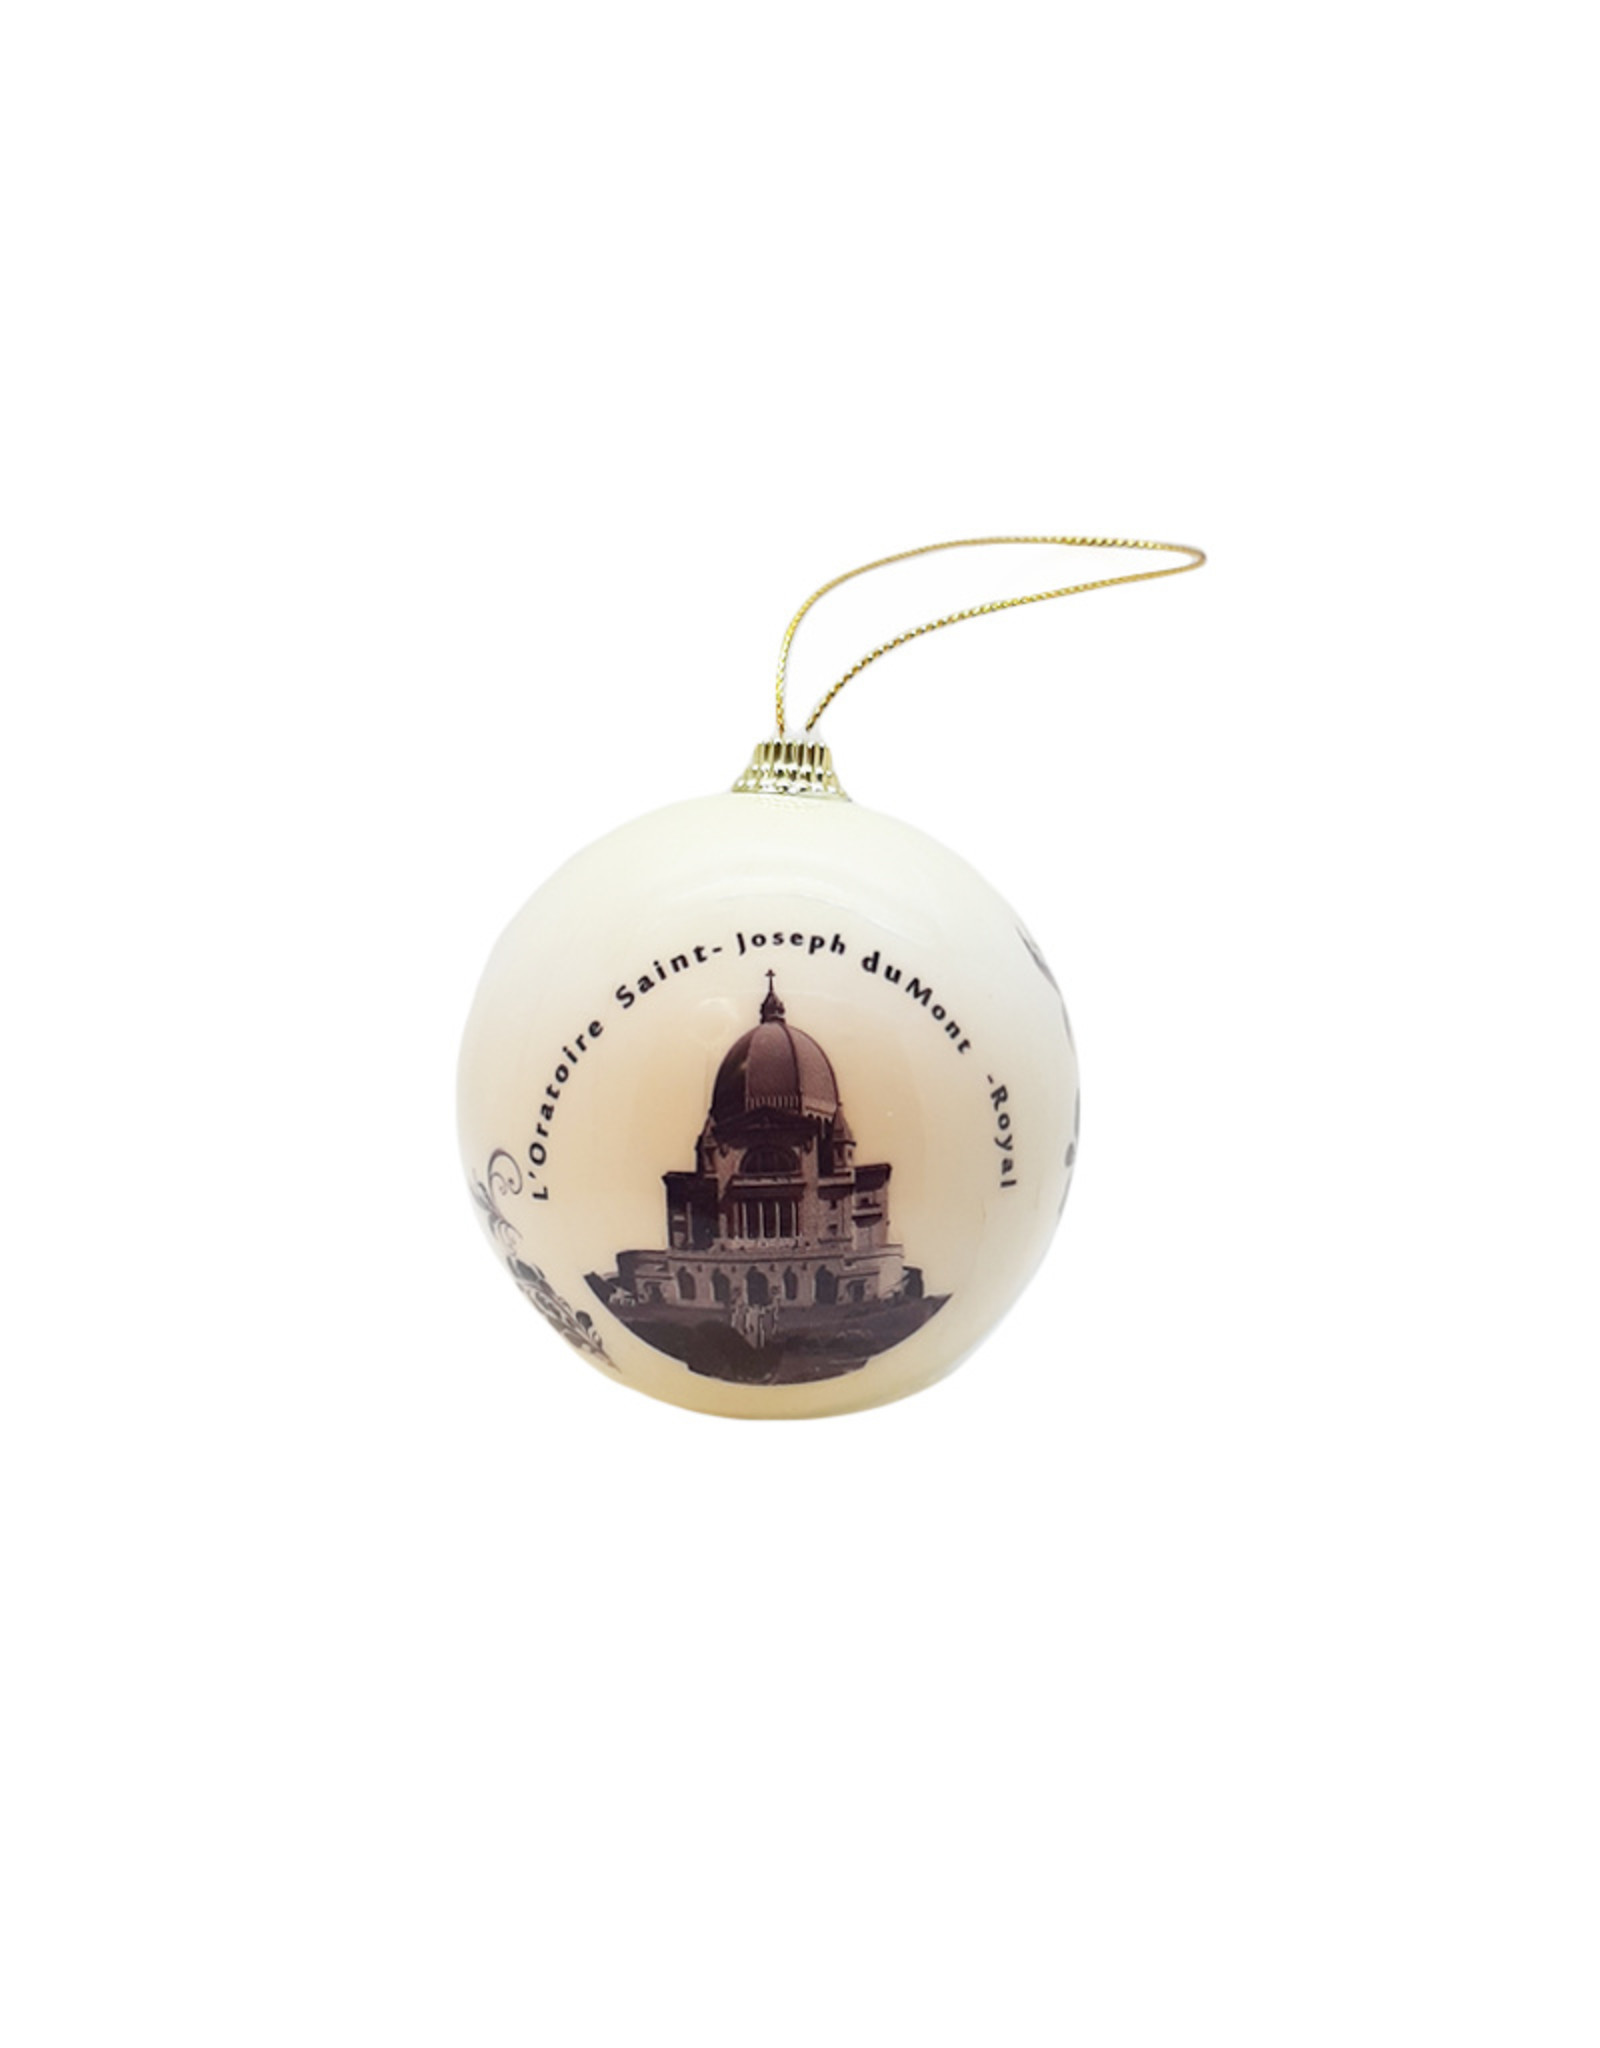 Saint Joseph's Oratory christmas ornament